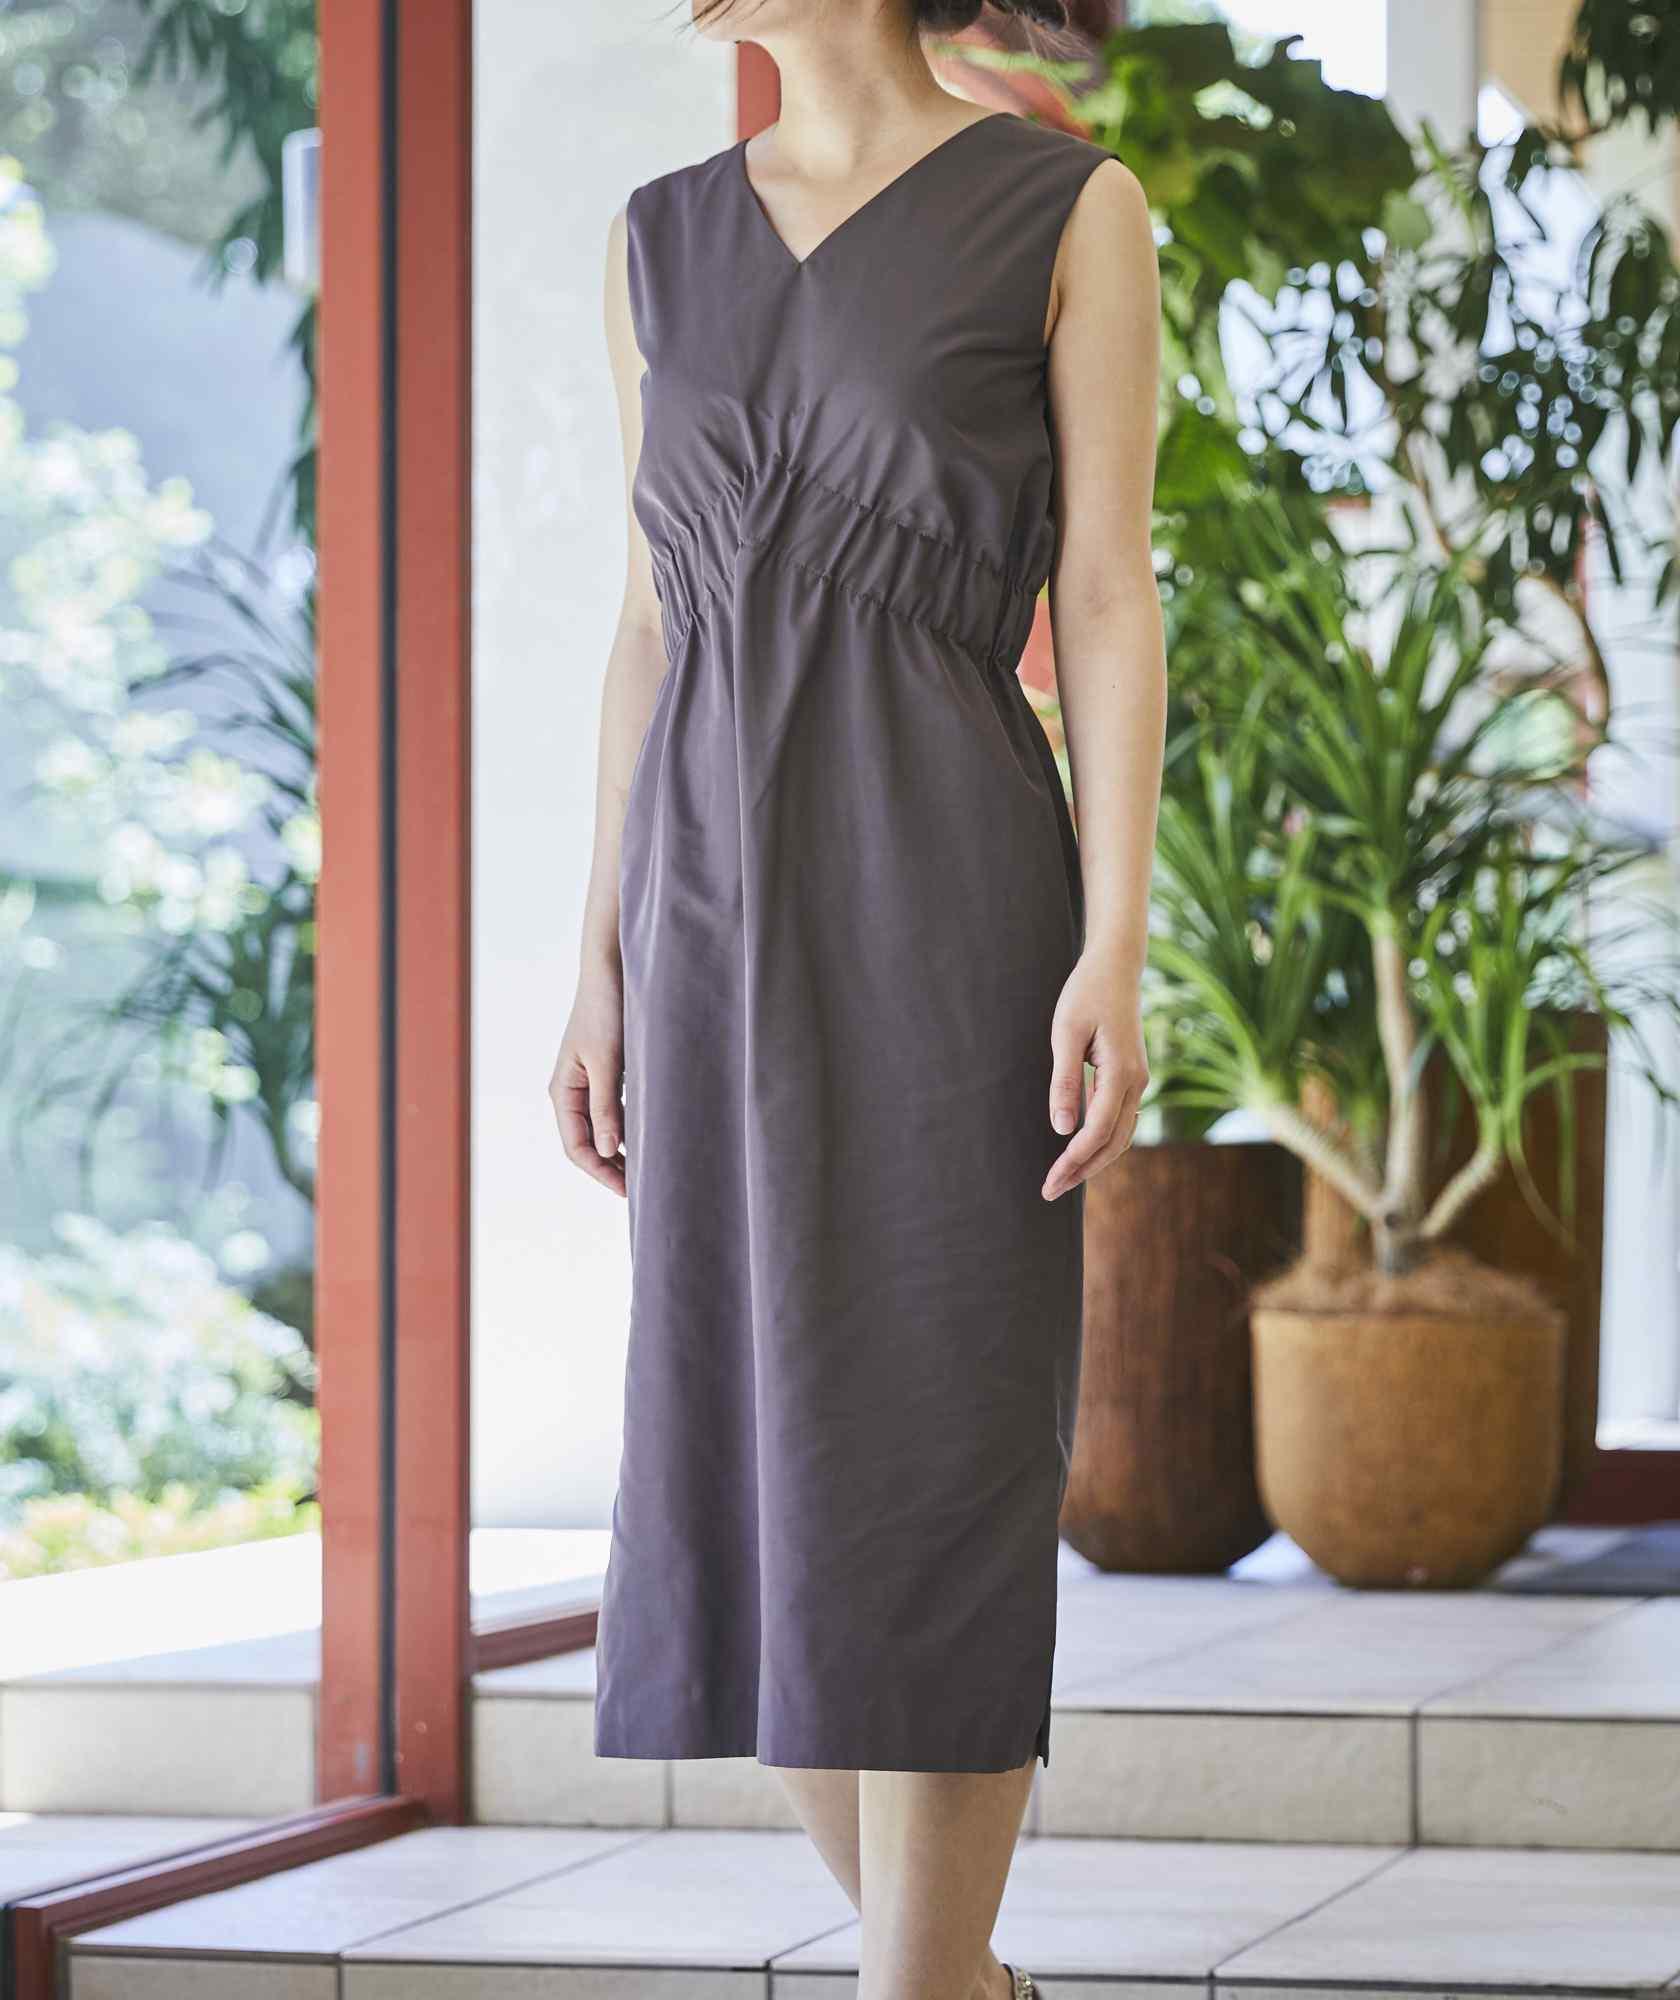 VネックシャーリングOGタイトミディアムドレス-グレー-M